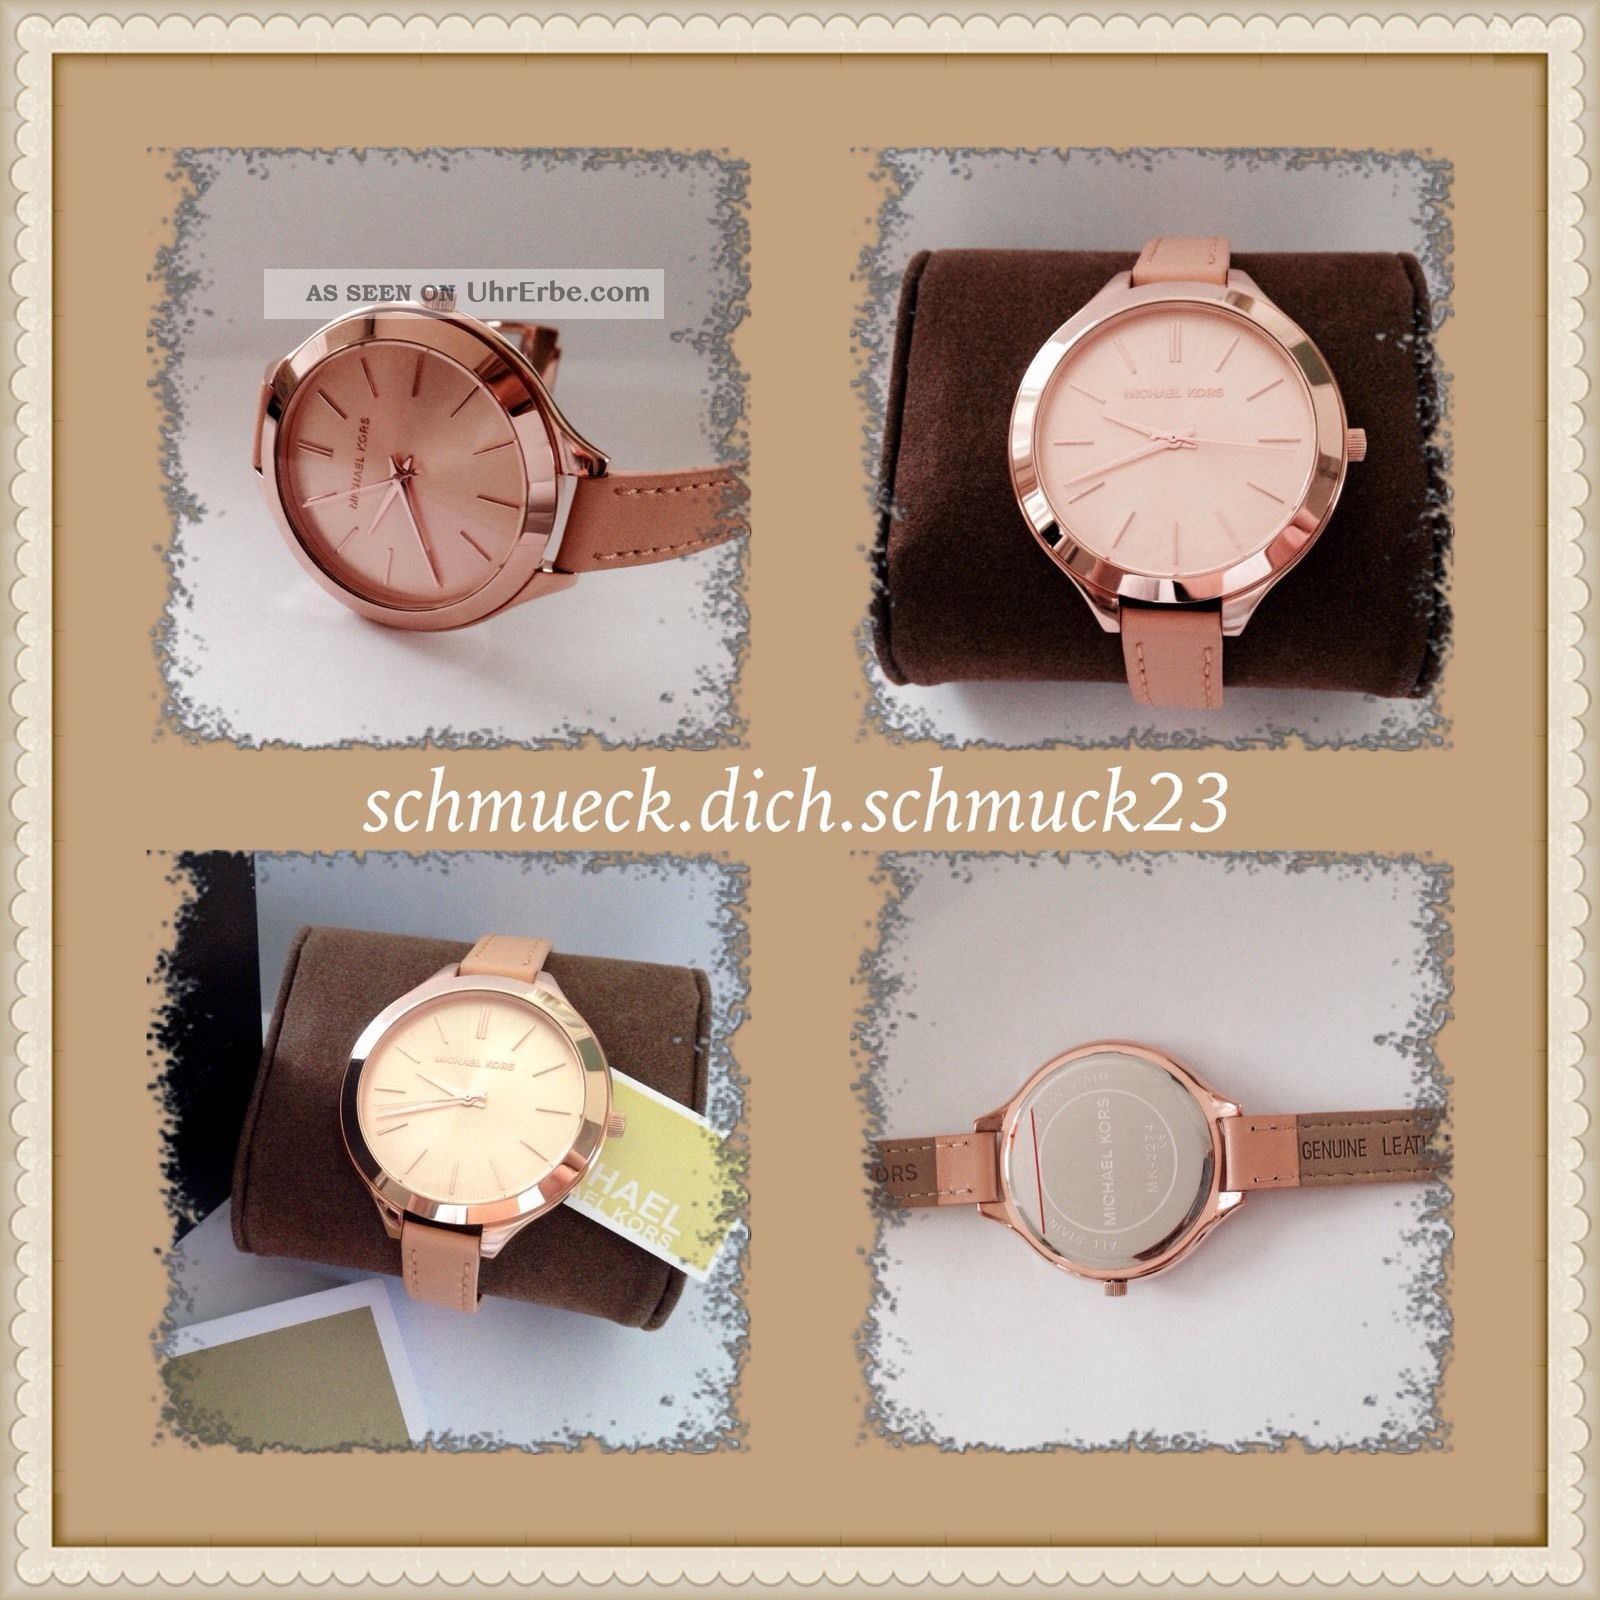 Michael Kors Mk2274 Logo Rose Gold Leder Beige Uhr Damenuhr Slim Runway Armbanduhren Bild